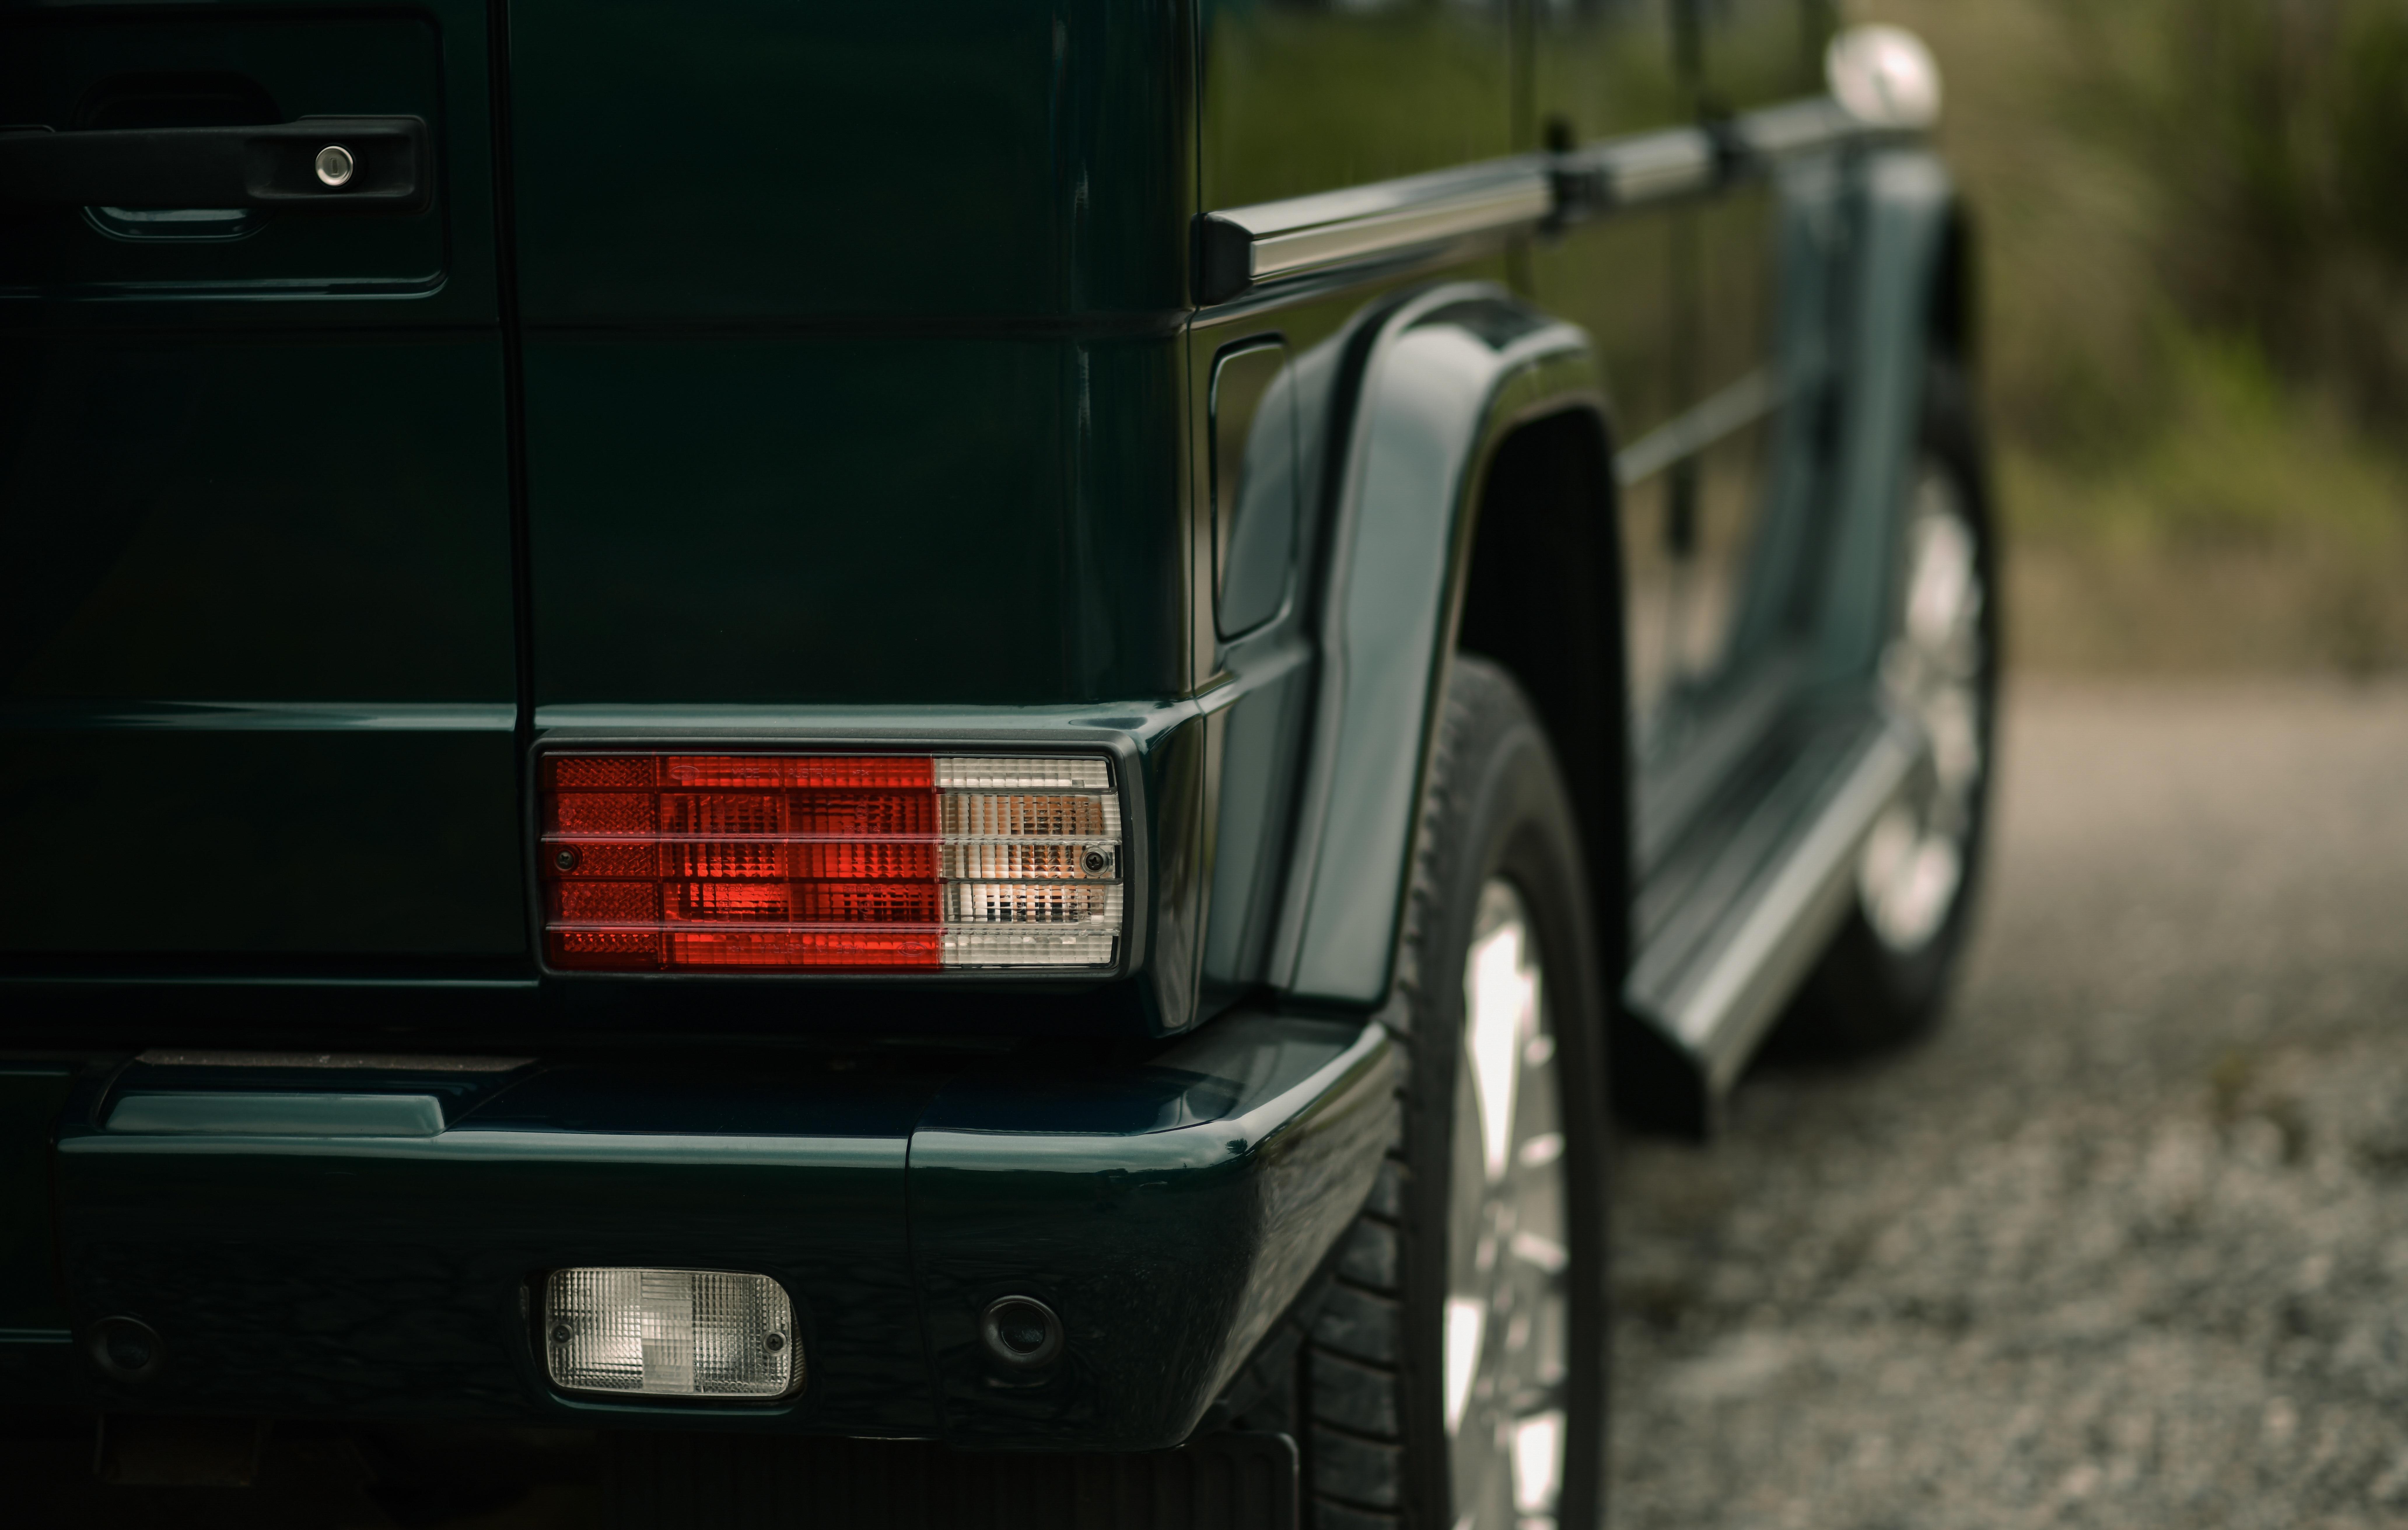 155181 Заставки и Обои Mercedes на телефон. Скачать Mercedes, Тачки (Cars), Вид Сзади, Фара, Mercedes-Benz C300 картинки бесплатно